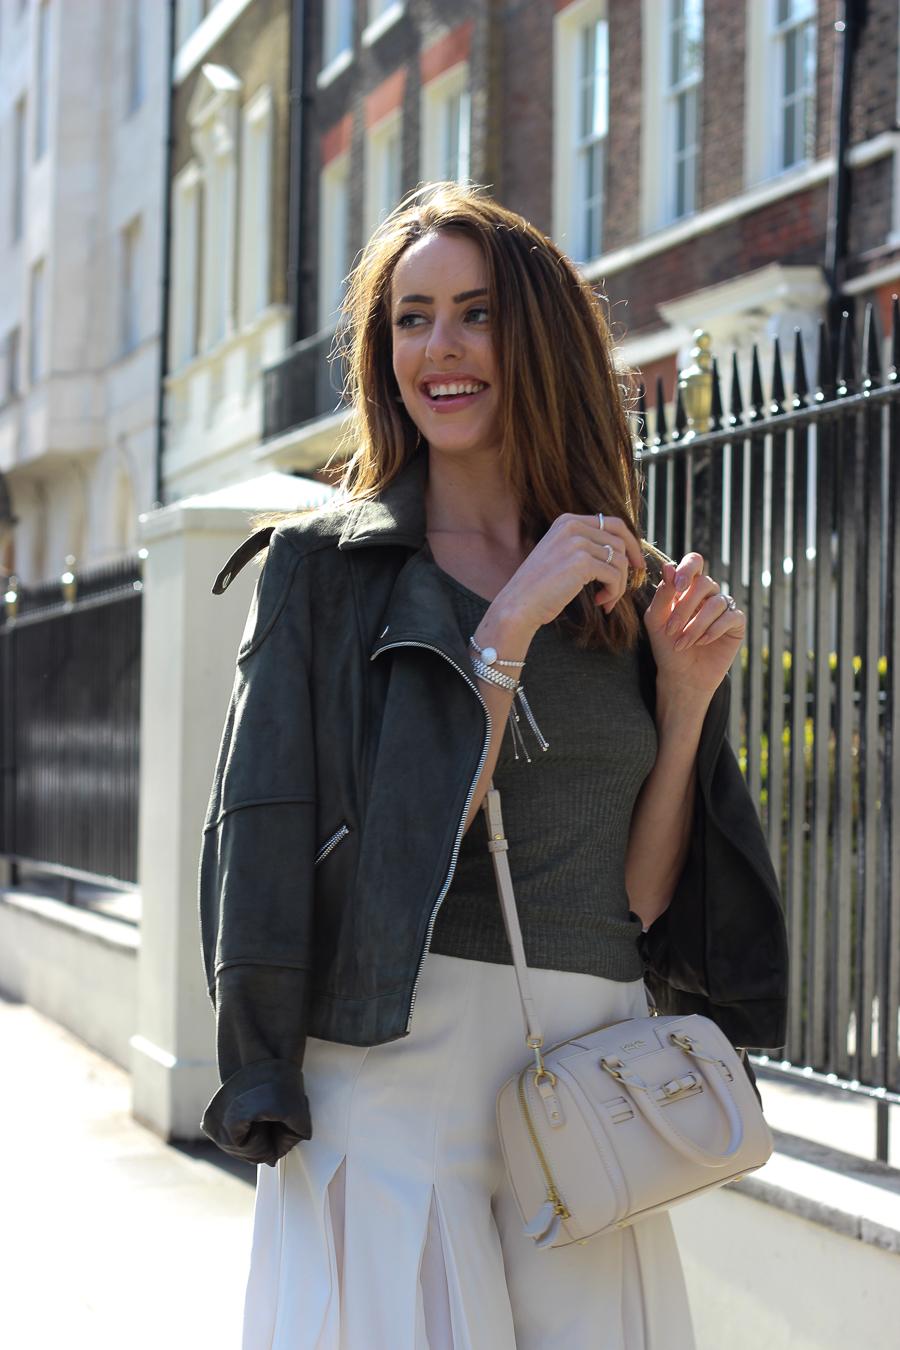 Folli Follie UK - Clutch and carry on - uk travel blogger, uk fashion blogger, london street style, sabrina chakici tblogger-42